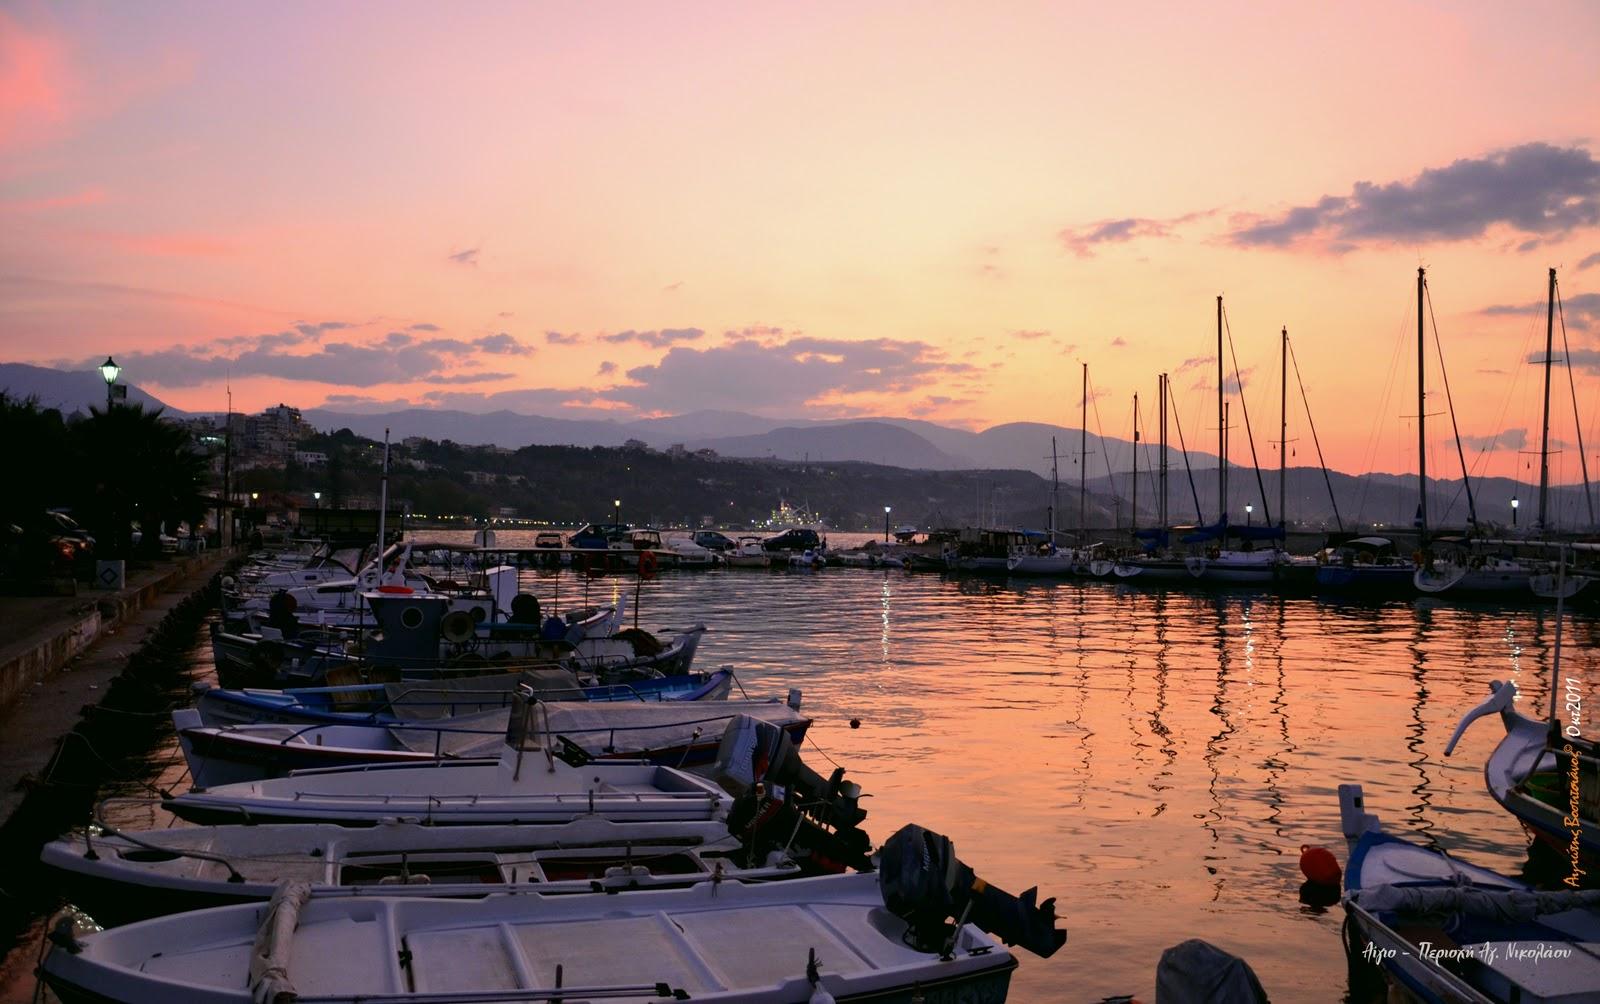 Aegio Agios Nikolaos